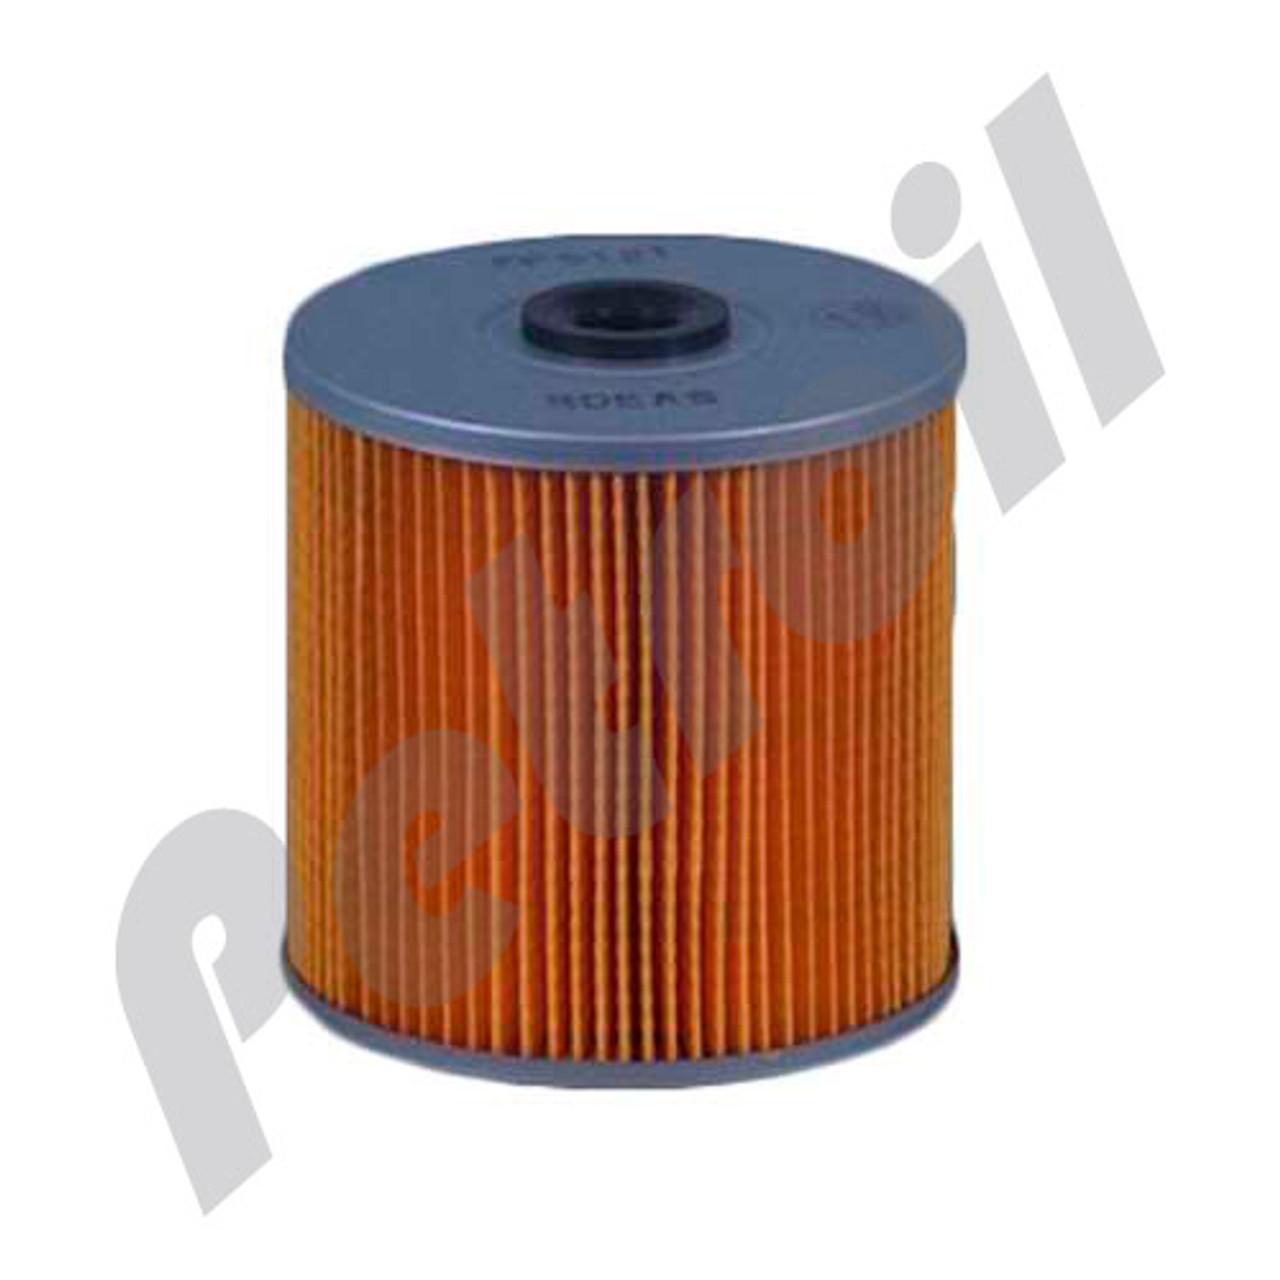 case of 12 ff5121 fleetguard fuel filter cartridge metal hinoshop by brand [ 1280 x 1280 Pixel ]